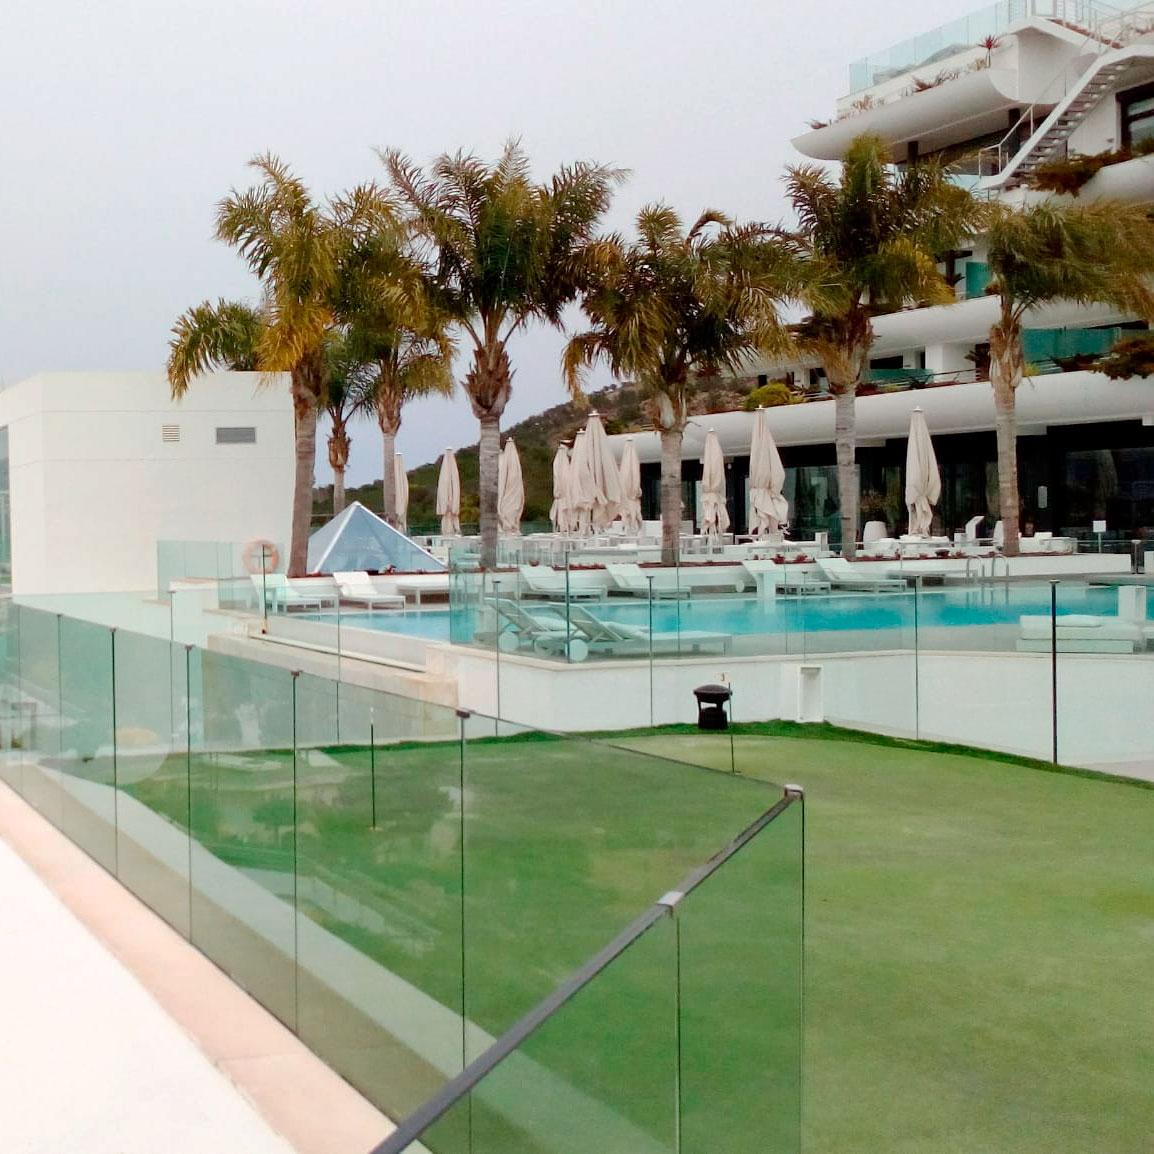 Césped artificial para hoteles por greenbusters